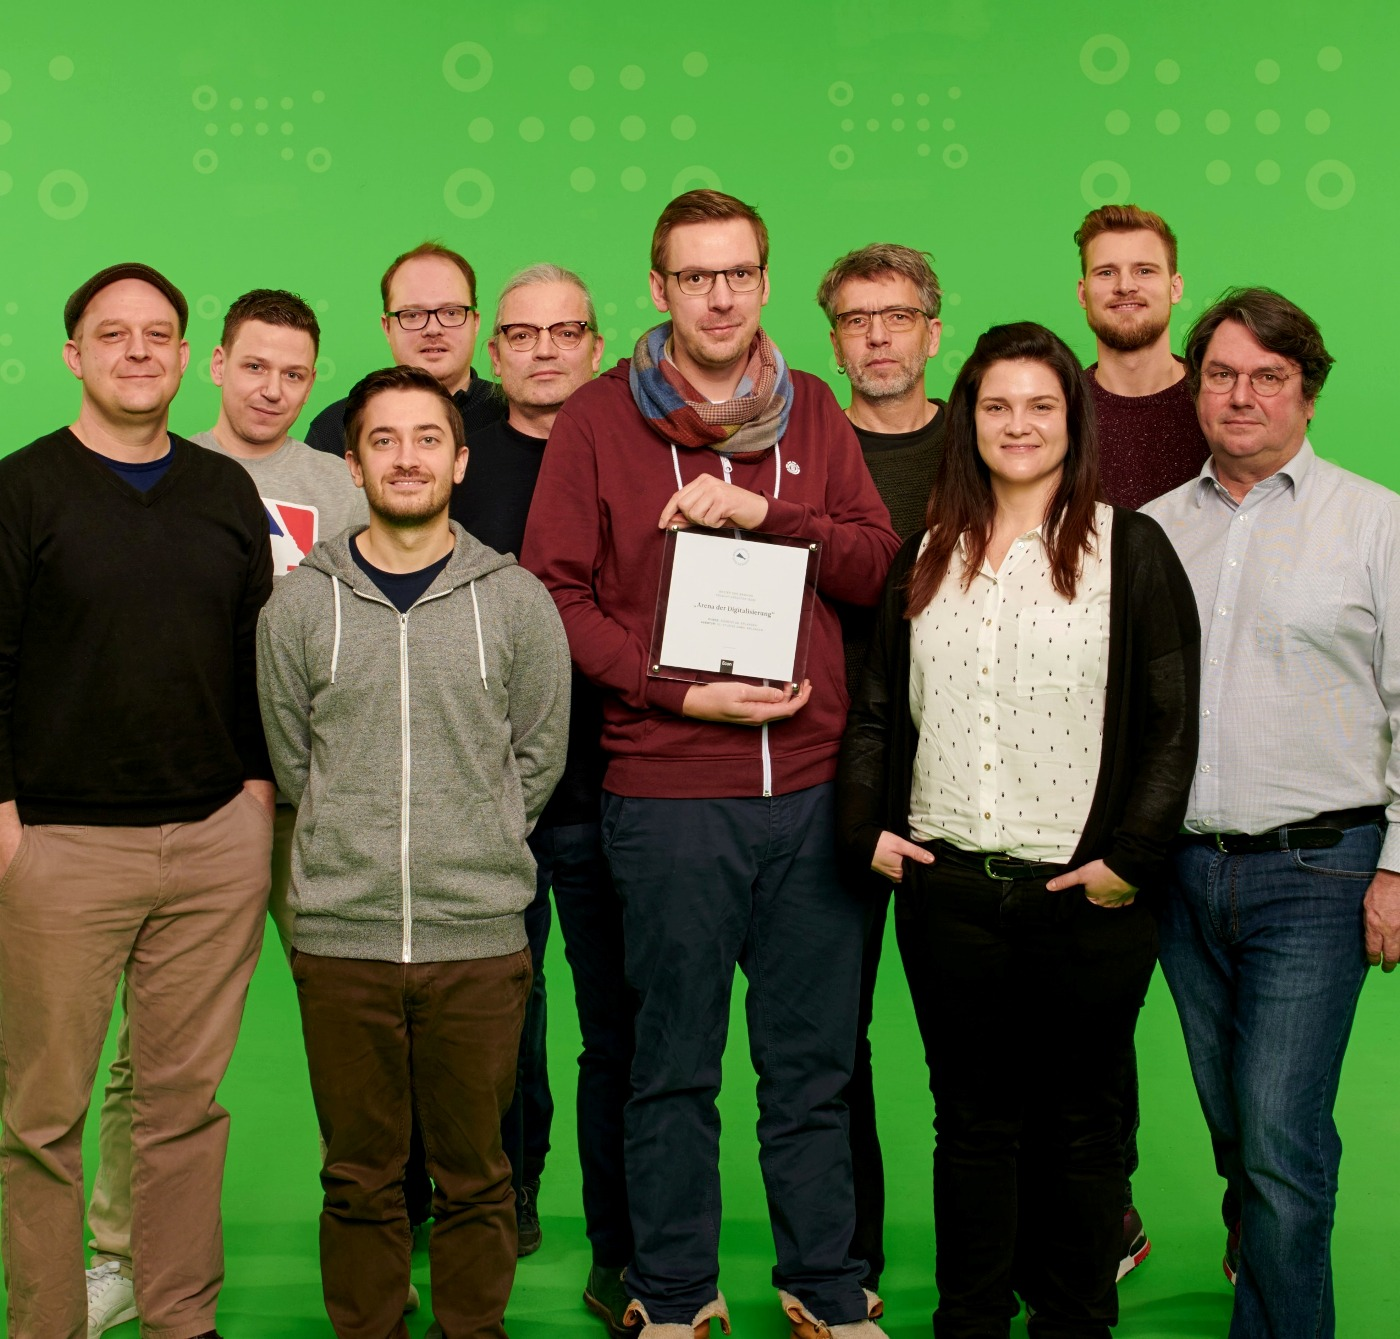 "(Foto: hl-studios, Erlangen): Team ""hl-studios"" Erlangen gewinnt bei den Econ Megaphon Awards 2018"